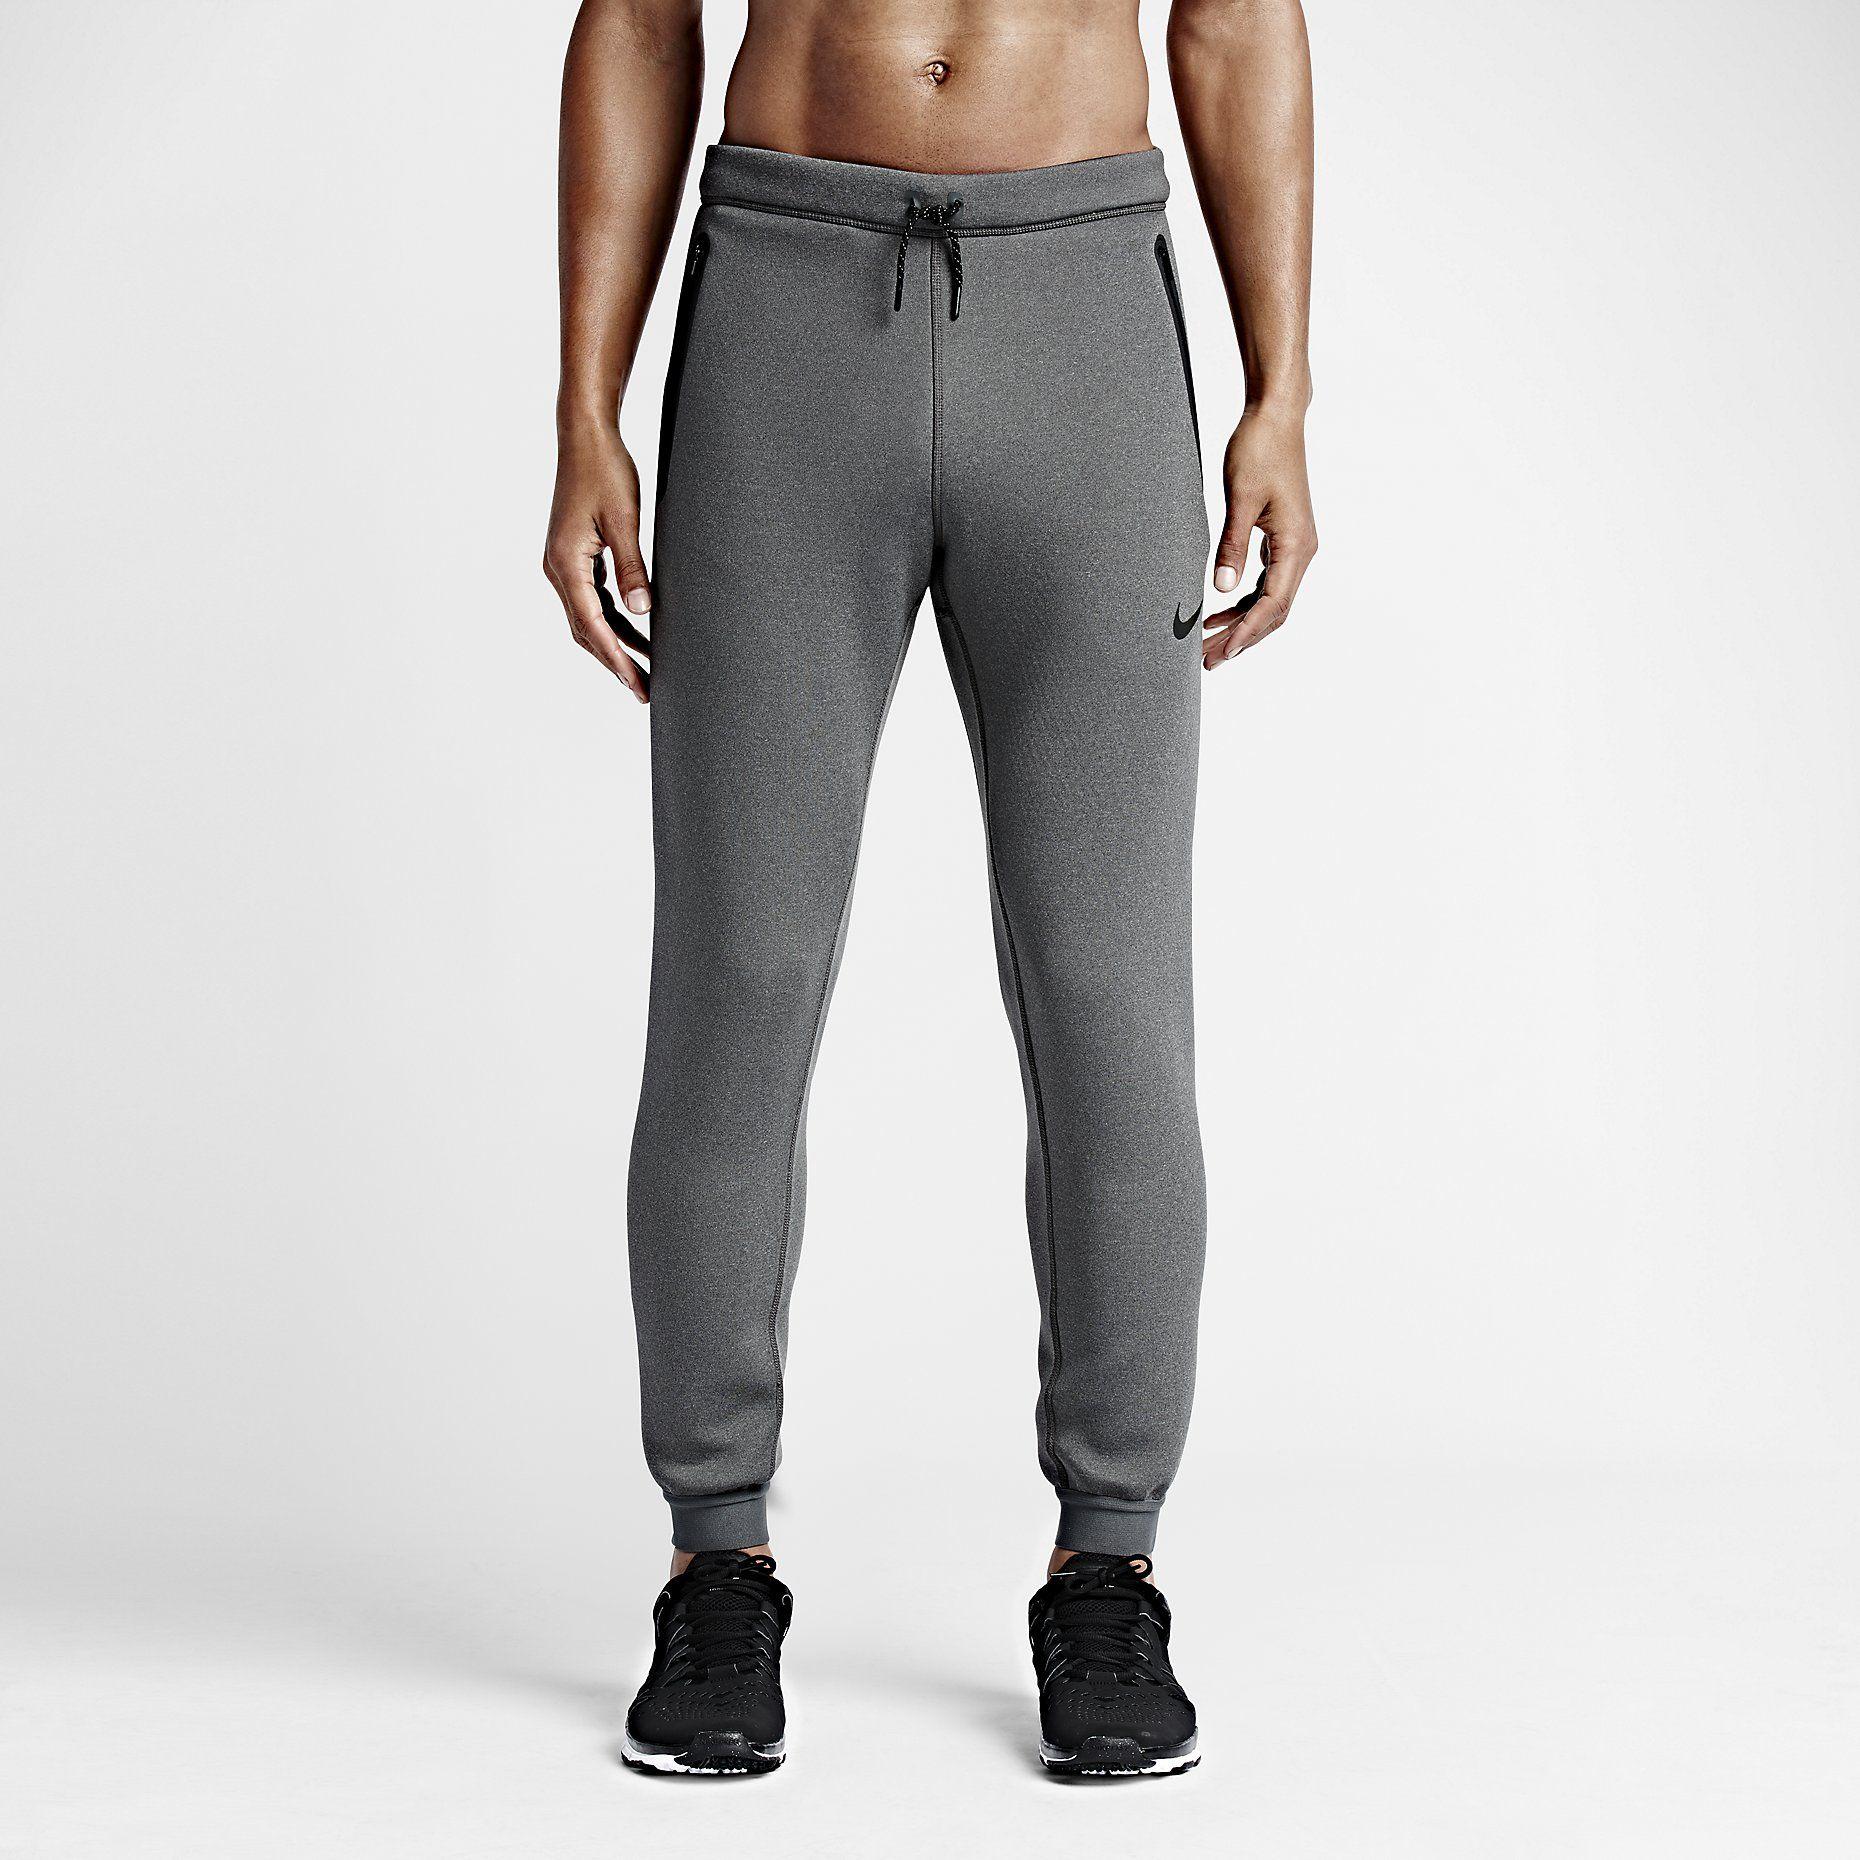 Nike Therma-Sphere Max Men's Training Pants Charcoal Heather/Dark Grey/Black